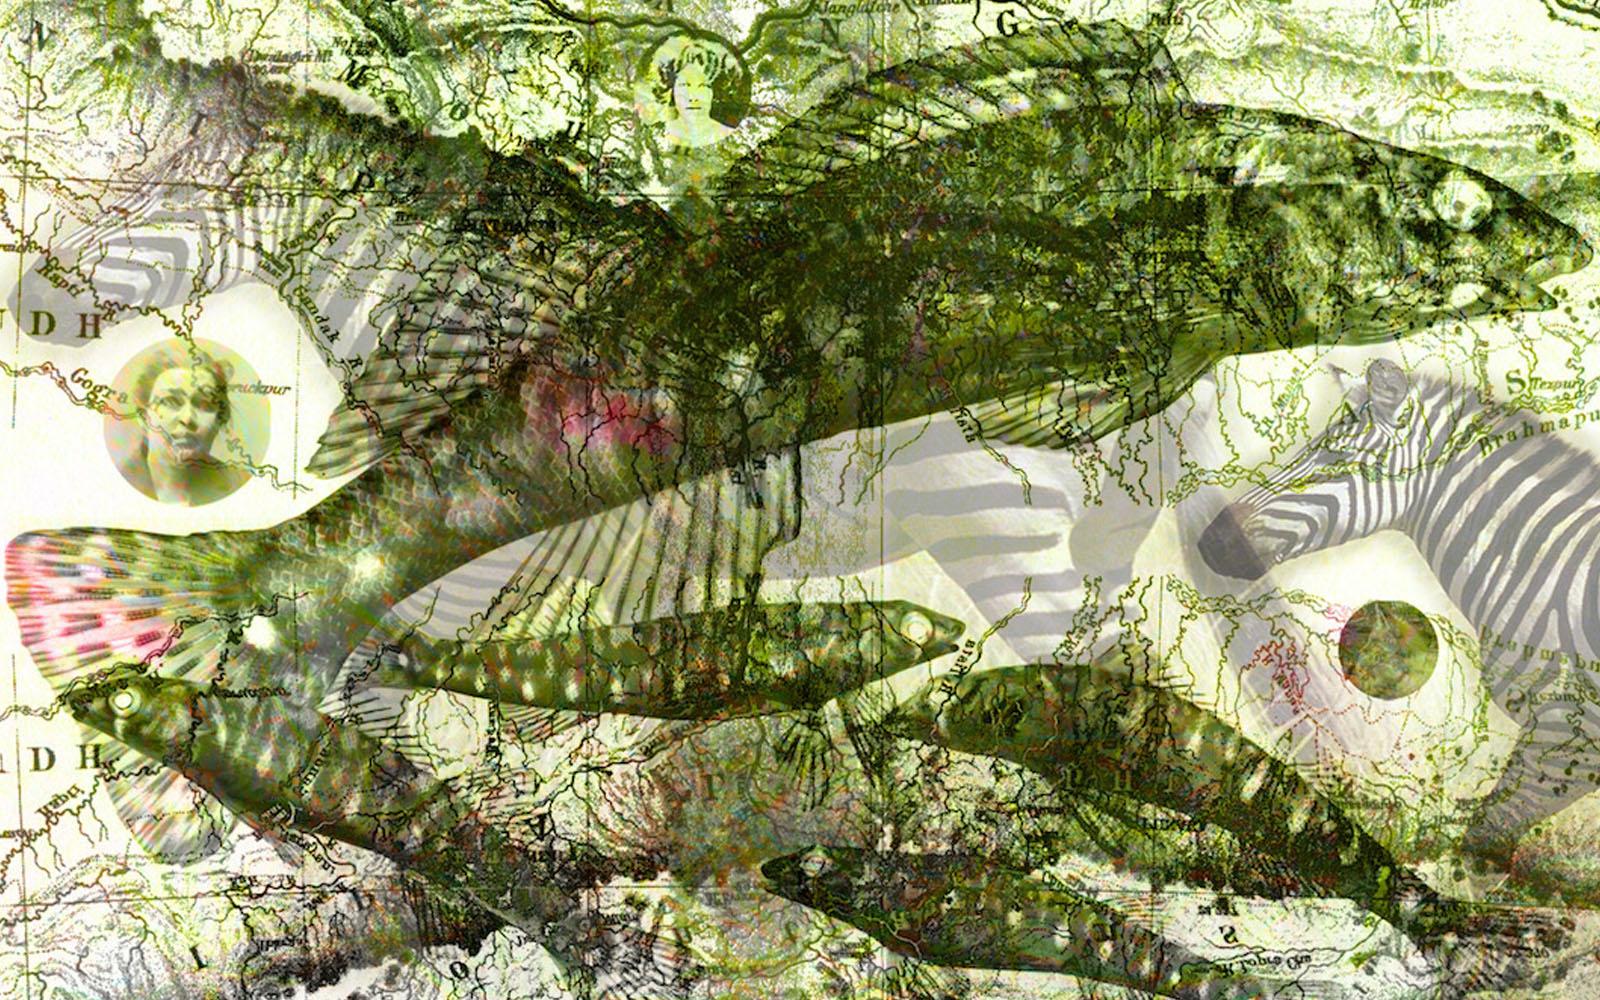 L'opera 'Giardino zoologico reale'. © Daniela Gorla